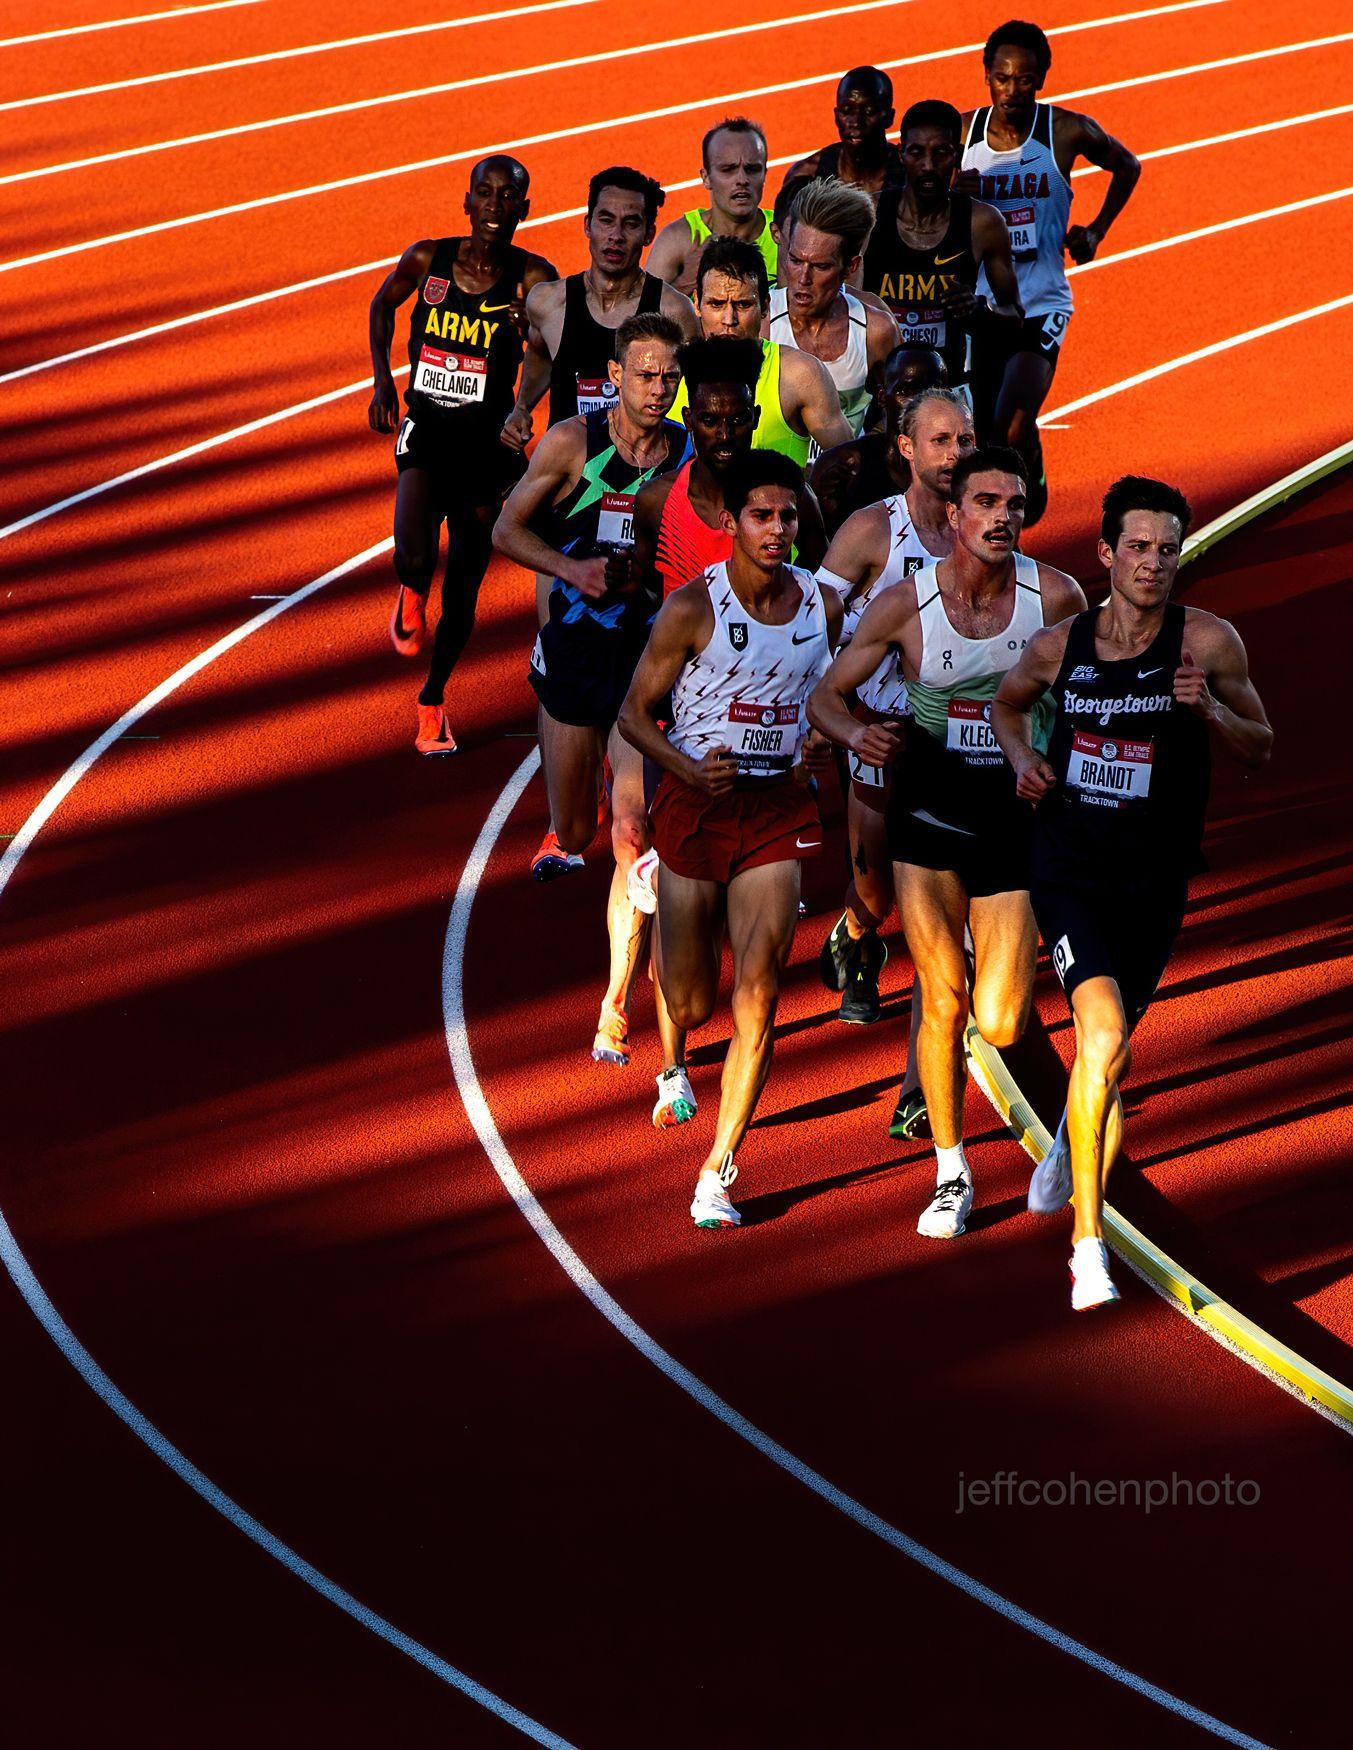 10000m-2021-US-Oly-Trials-day-13330-jeff-cohen-photo---copy-DeNoiseAI-standard-web.jpg